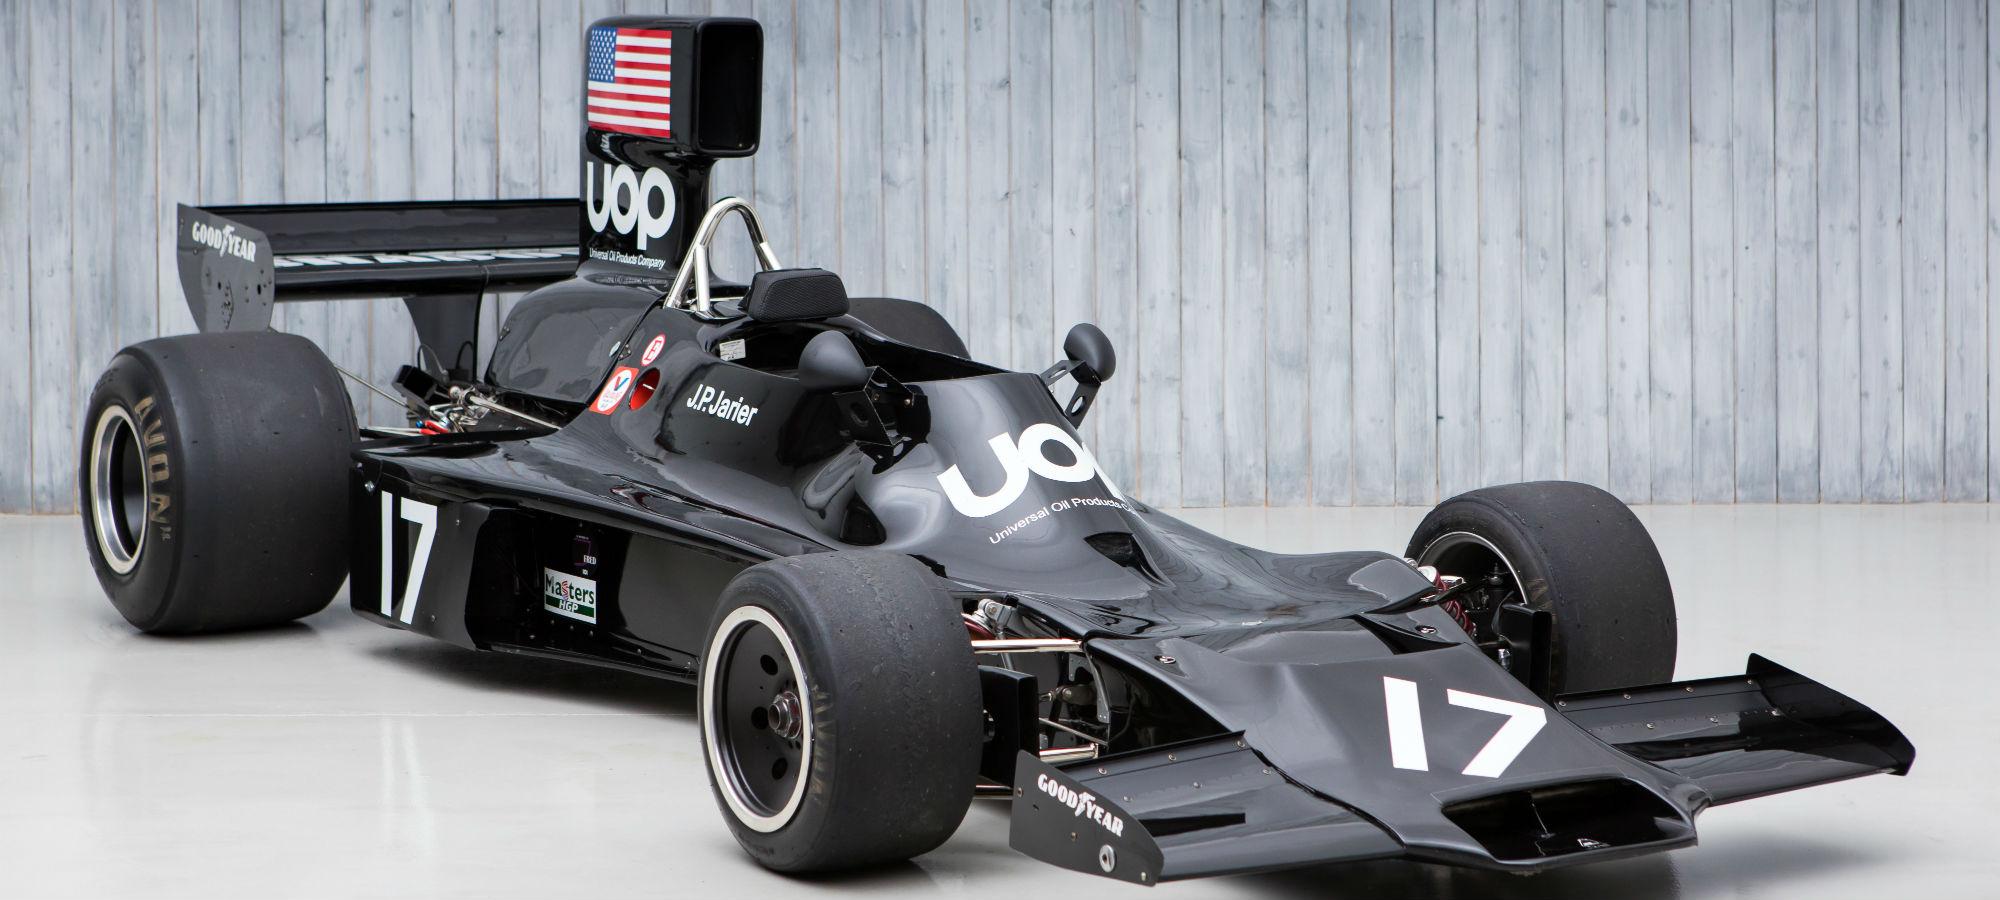 The Ex - J.P. Jarier, 3rd in the 1974 Monaco Grand Prix 1974 Shadow DN3 Formula 1